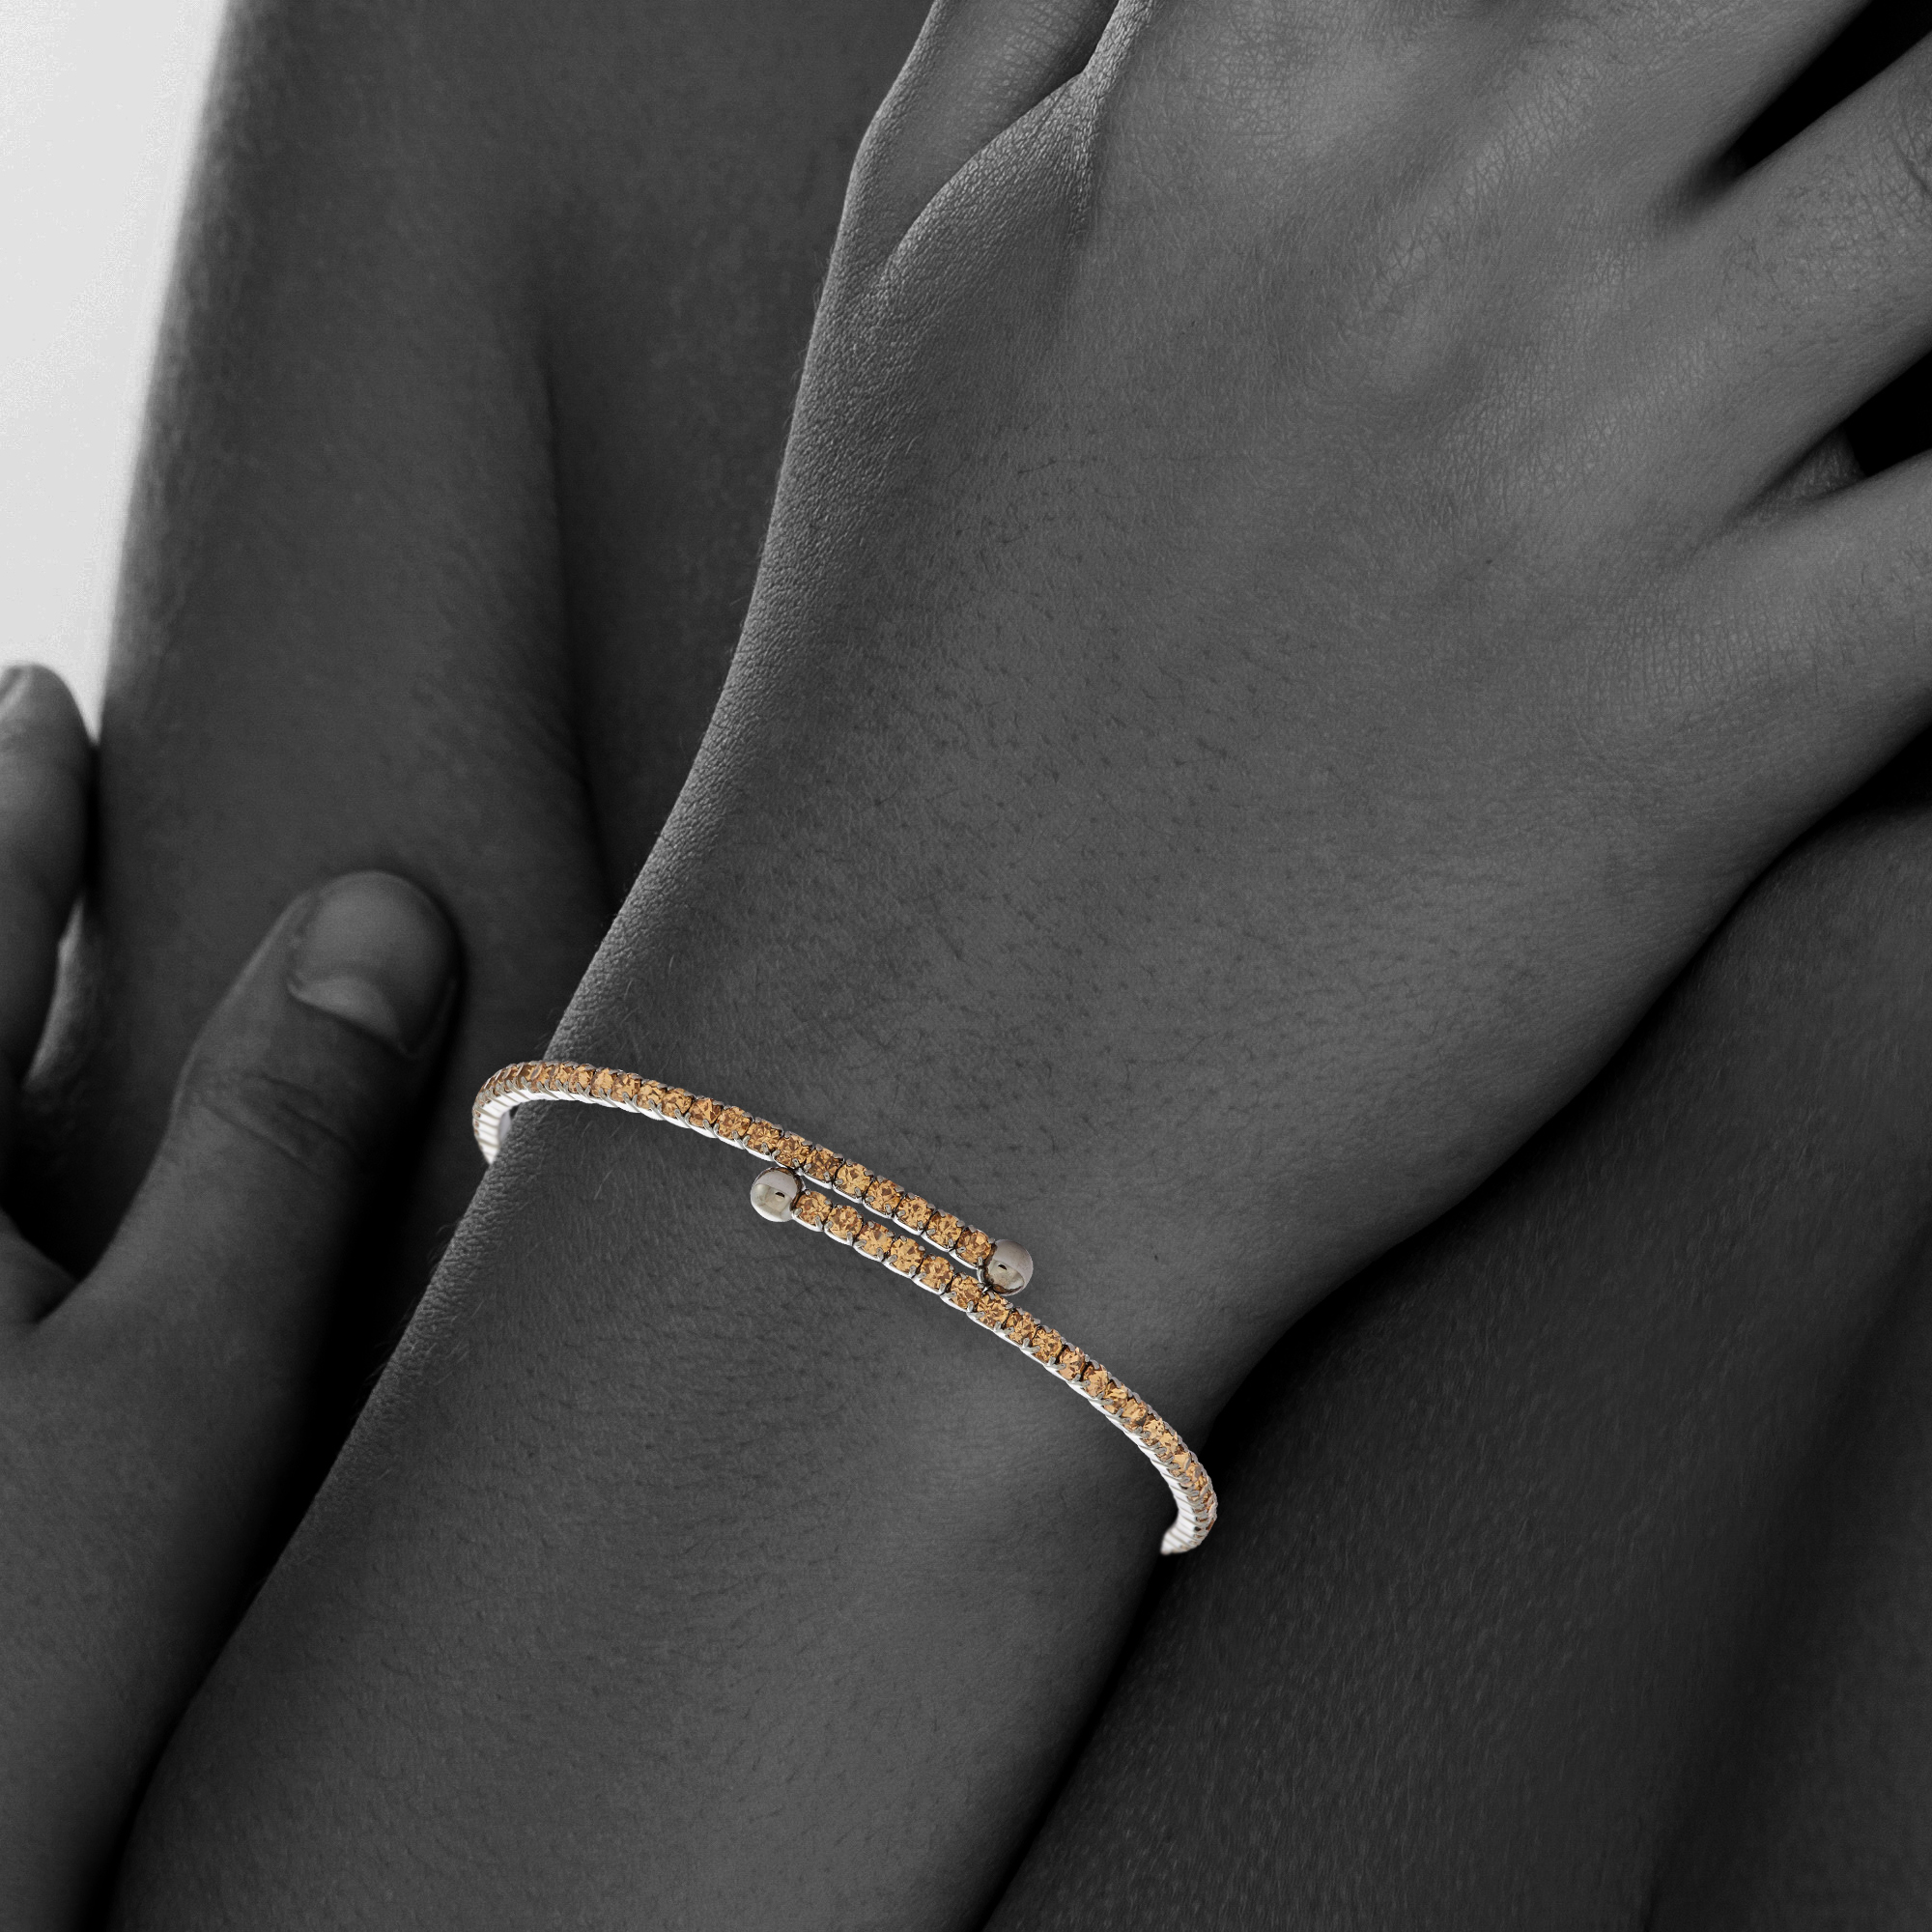 Womens-Ladies-Fashion-Accessories-Jewelry-Black-Rhodium-Plated-Bangle-Bracelet thumbnail 28